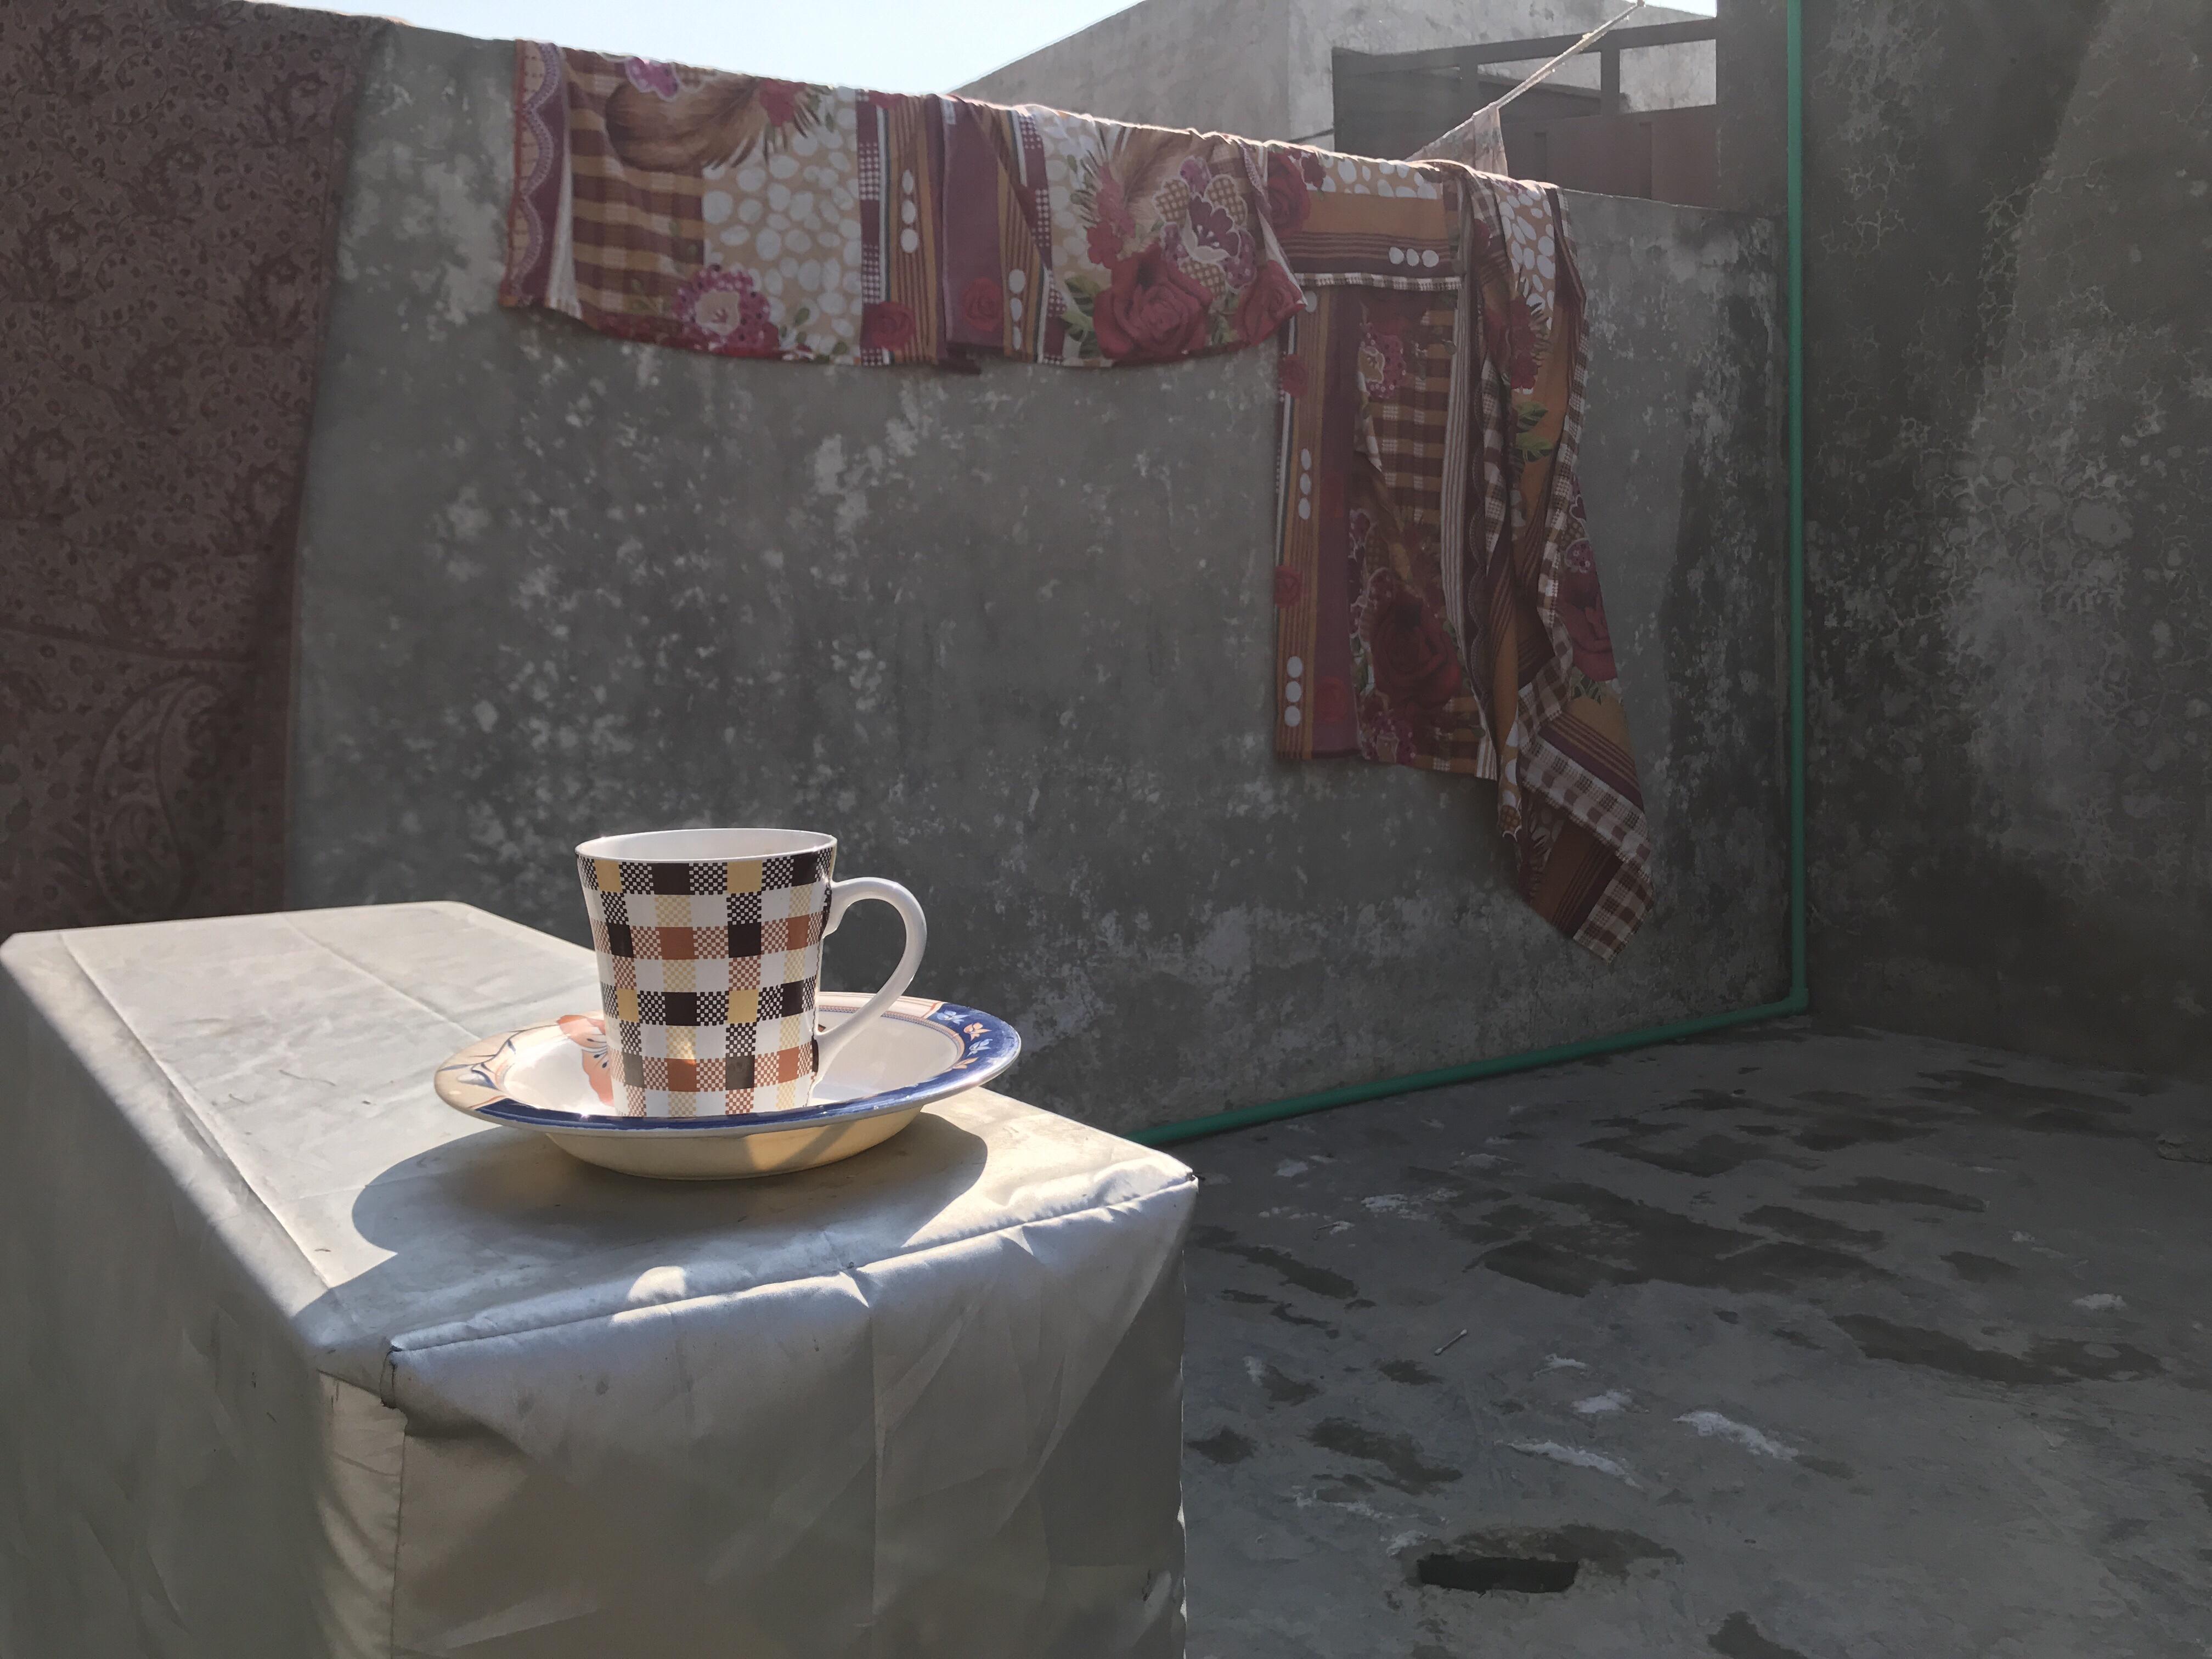 Sista kaffet på taket